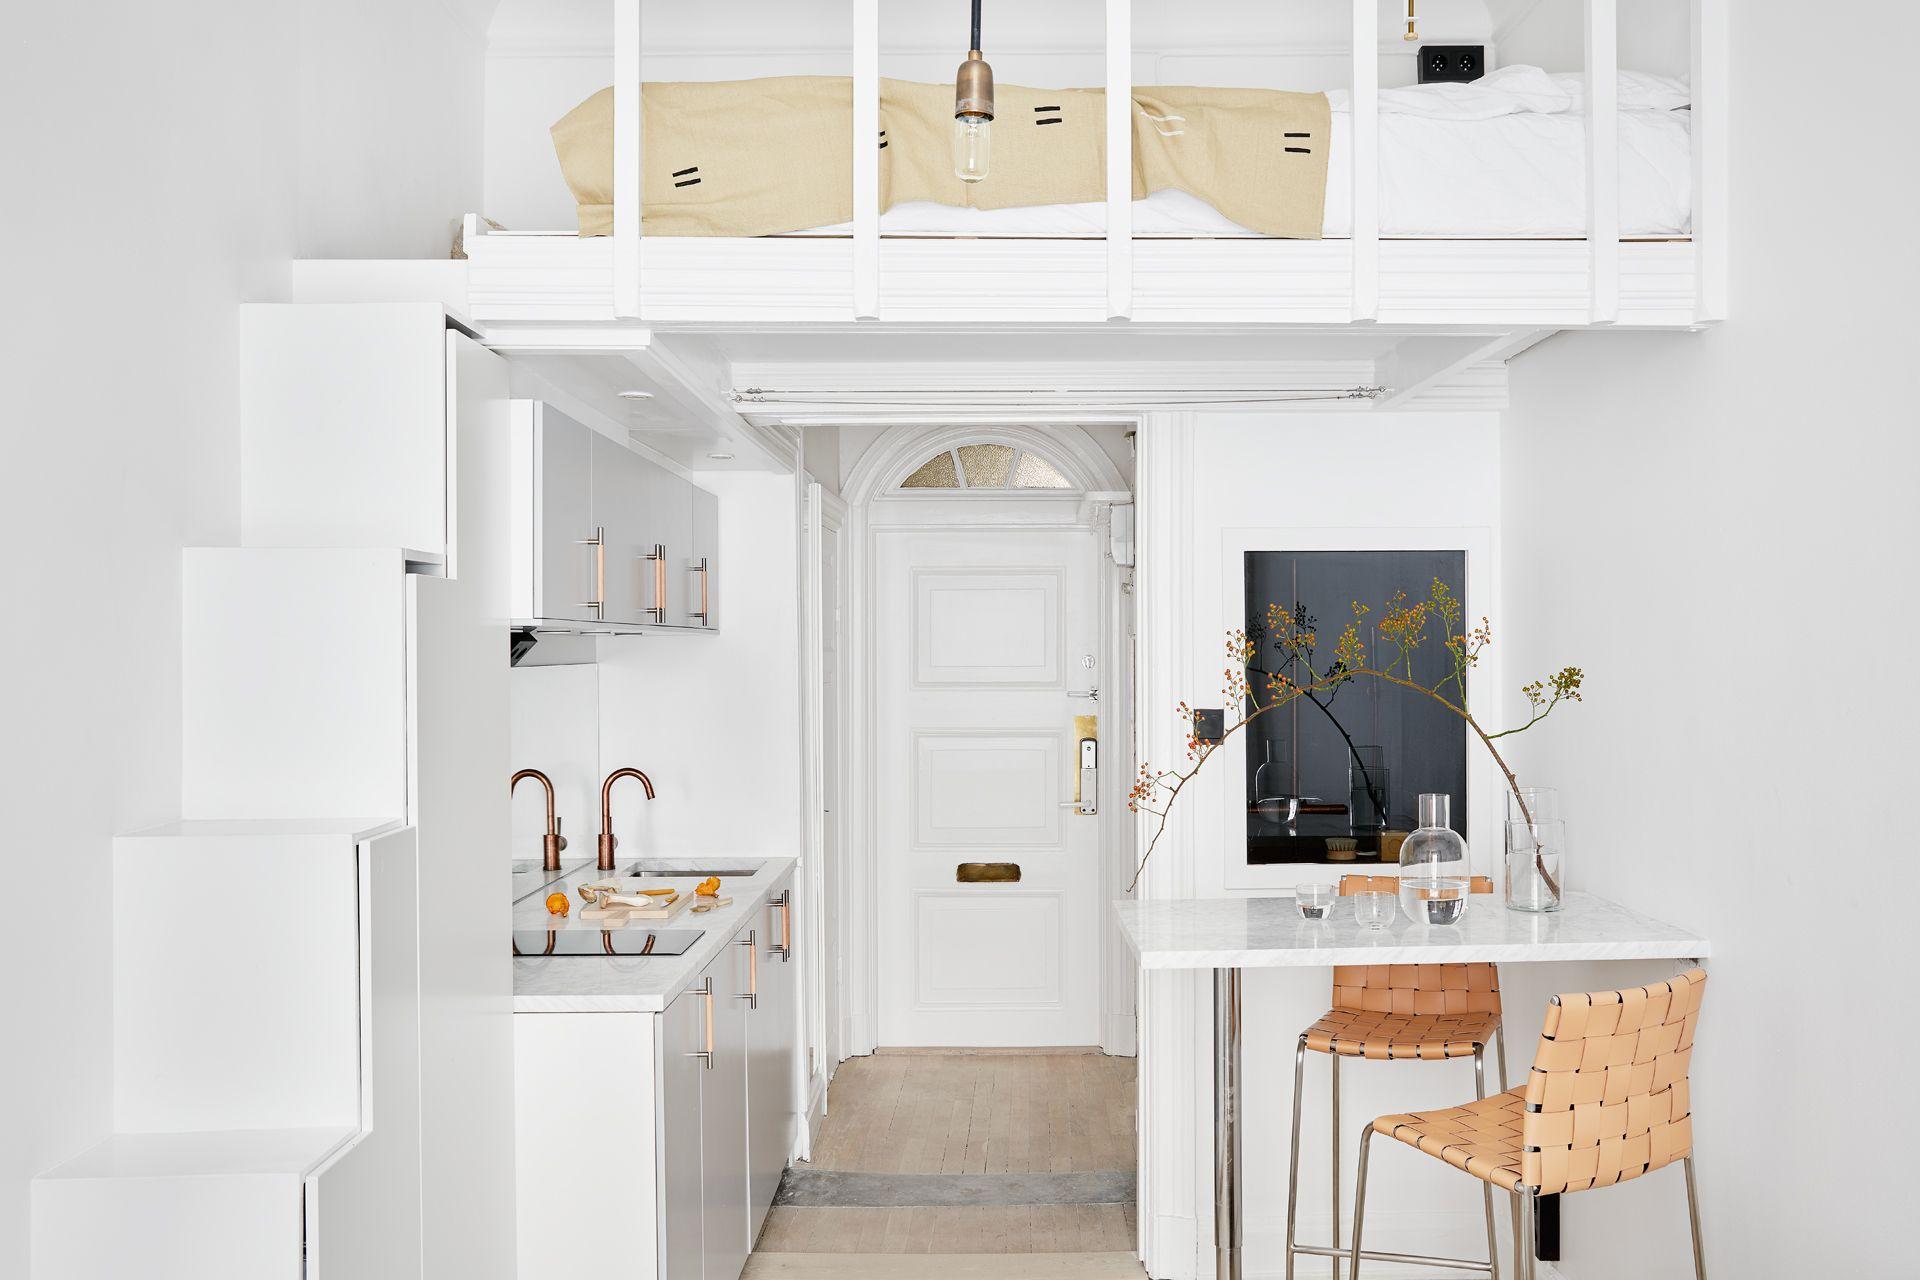 A Japanese Inspired Apartment With Plenty Storage Systems: 2 Monoambientes Muy Pequeños Con Entrepiso Para La Cama